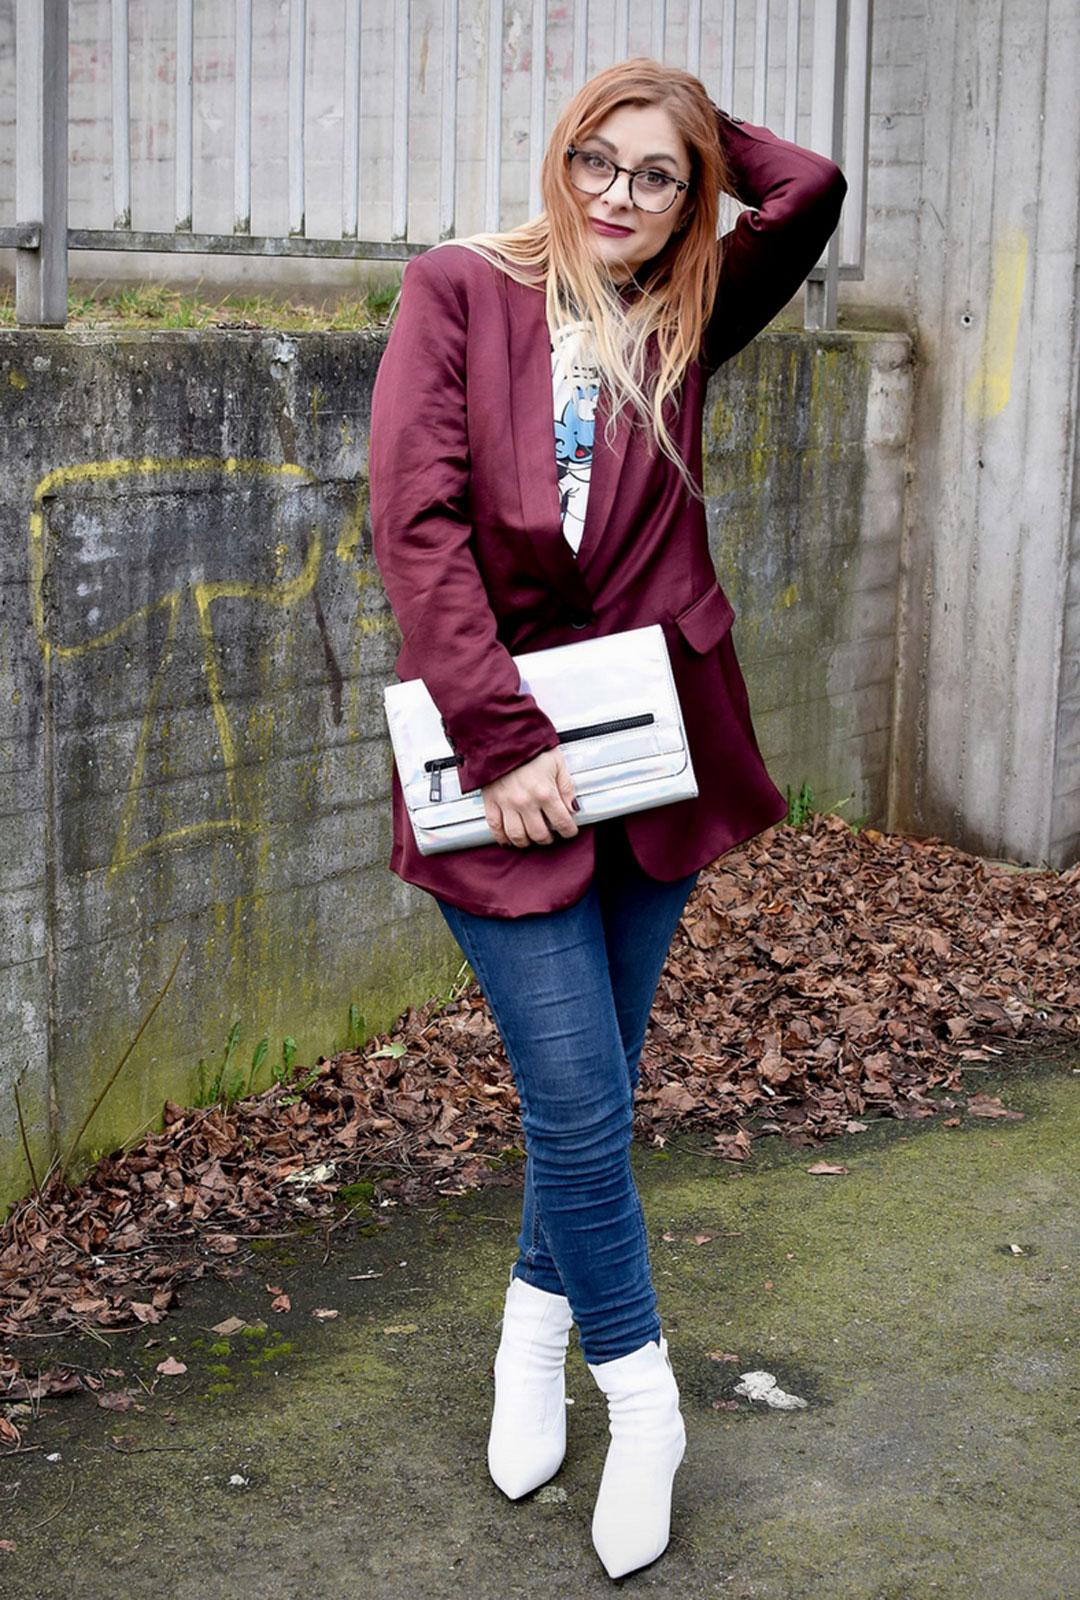 Weiße Schuhe, Jeans, Blazer, Clutch in Holooptik, Clutch Holoeffekt